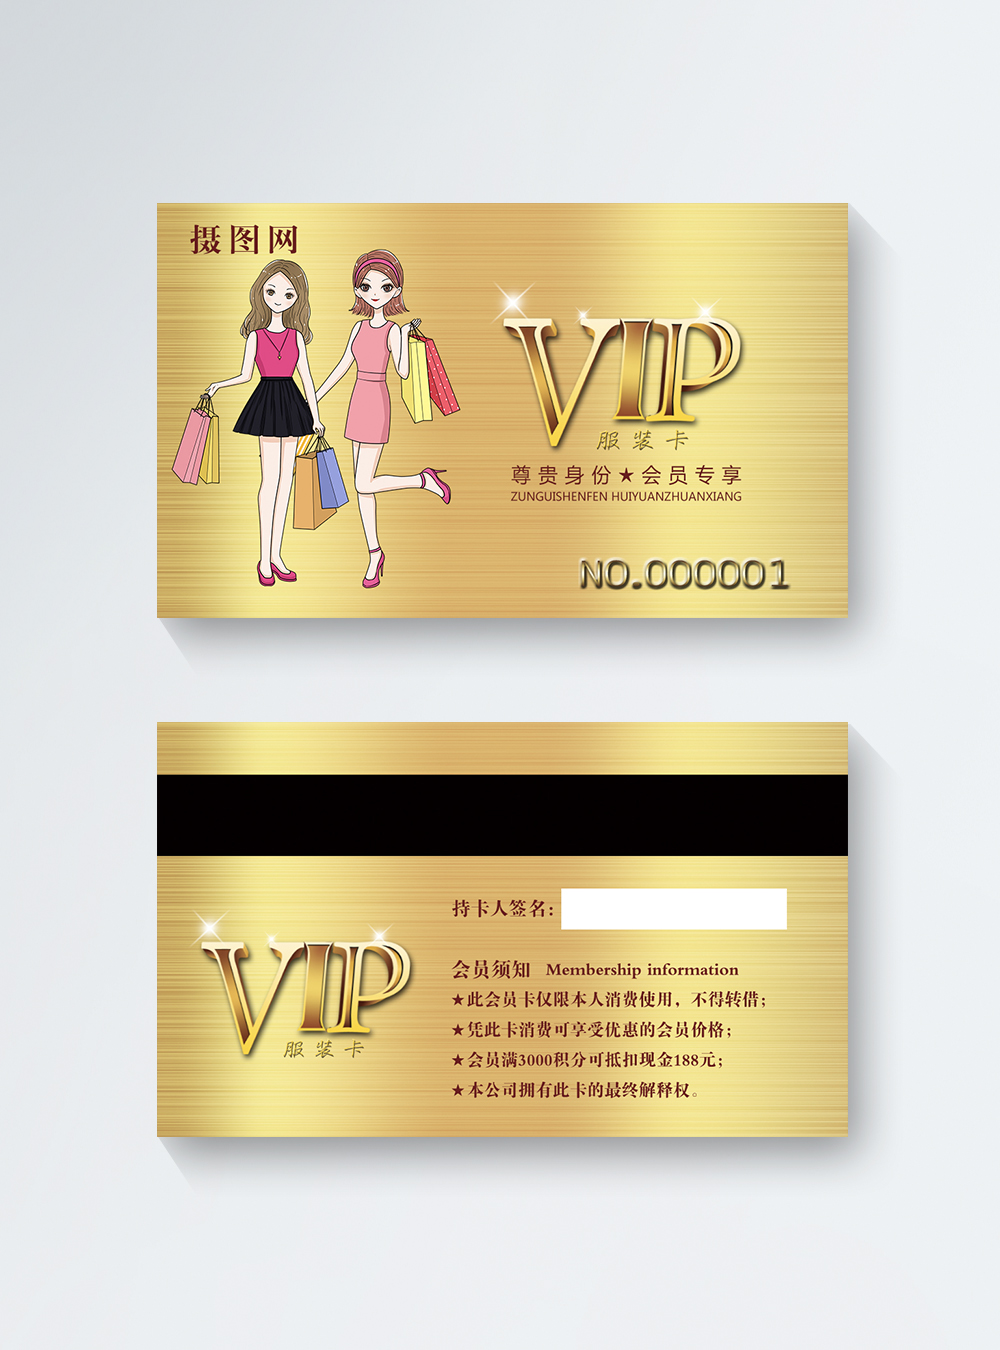 Clothing store membership card vip gold card template ...